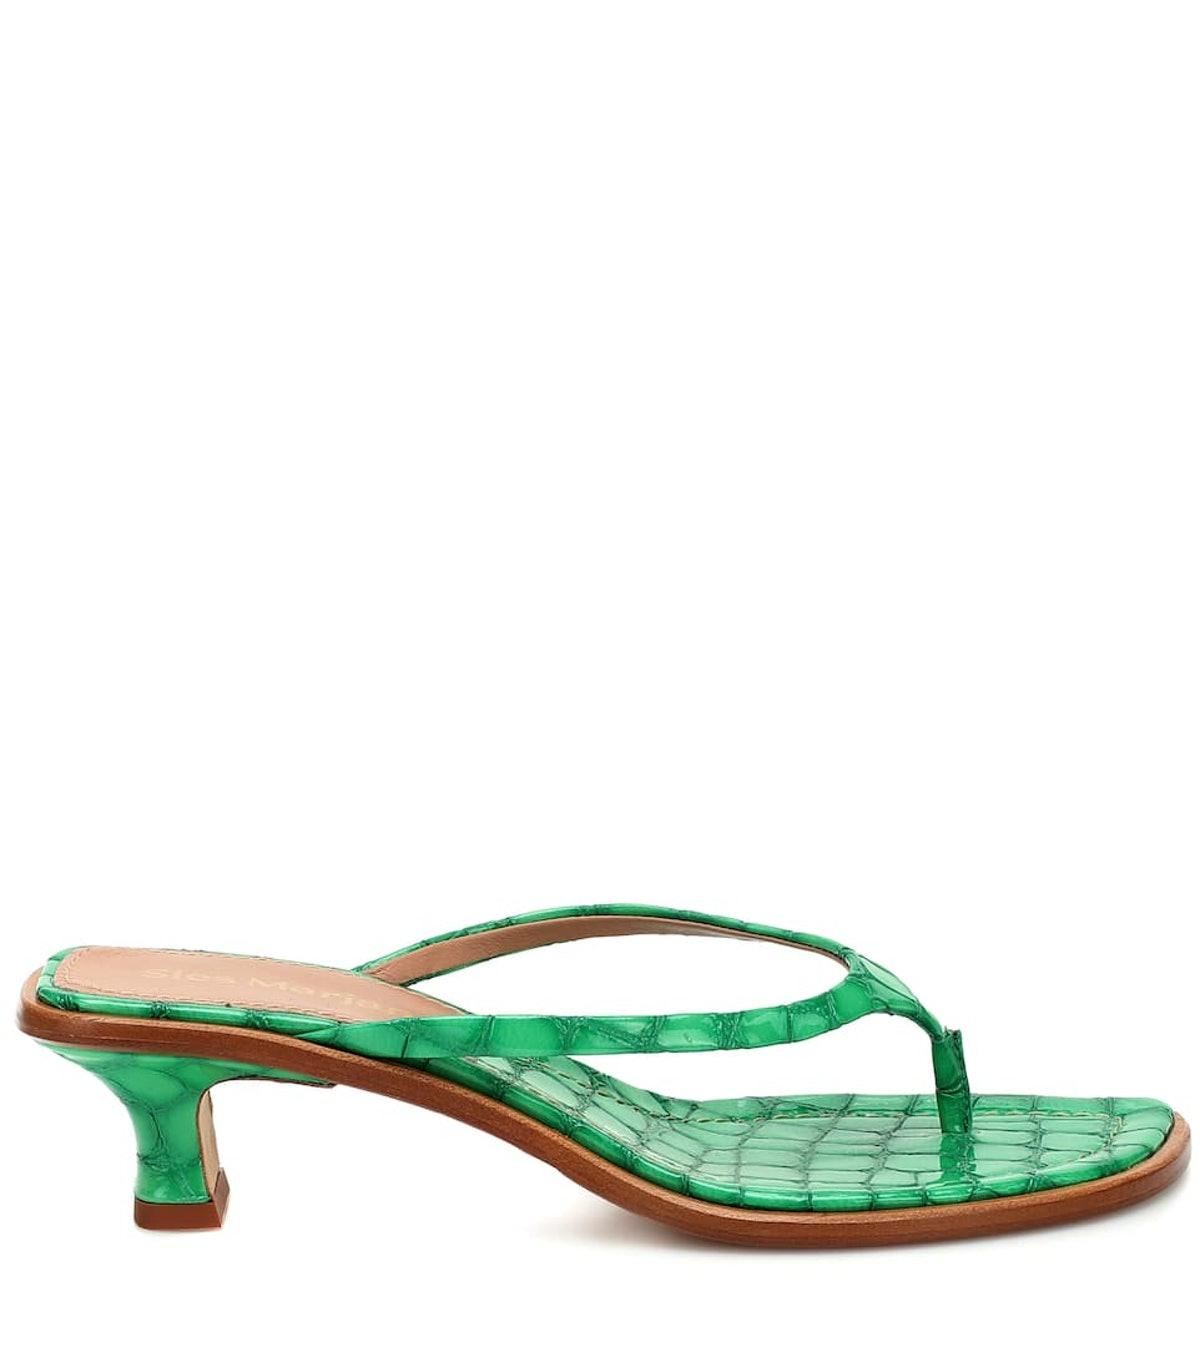 Sies Marjan Alix Thong Strap Patent Croc-Effect Heel